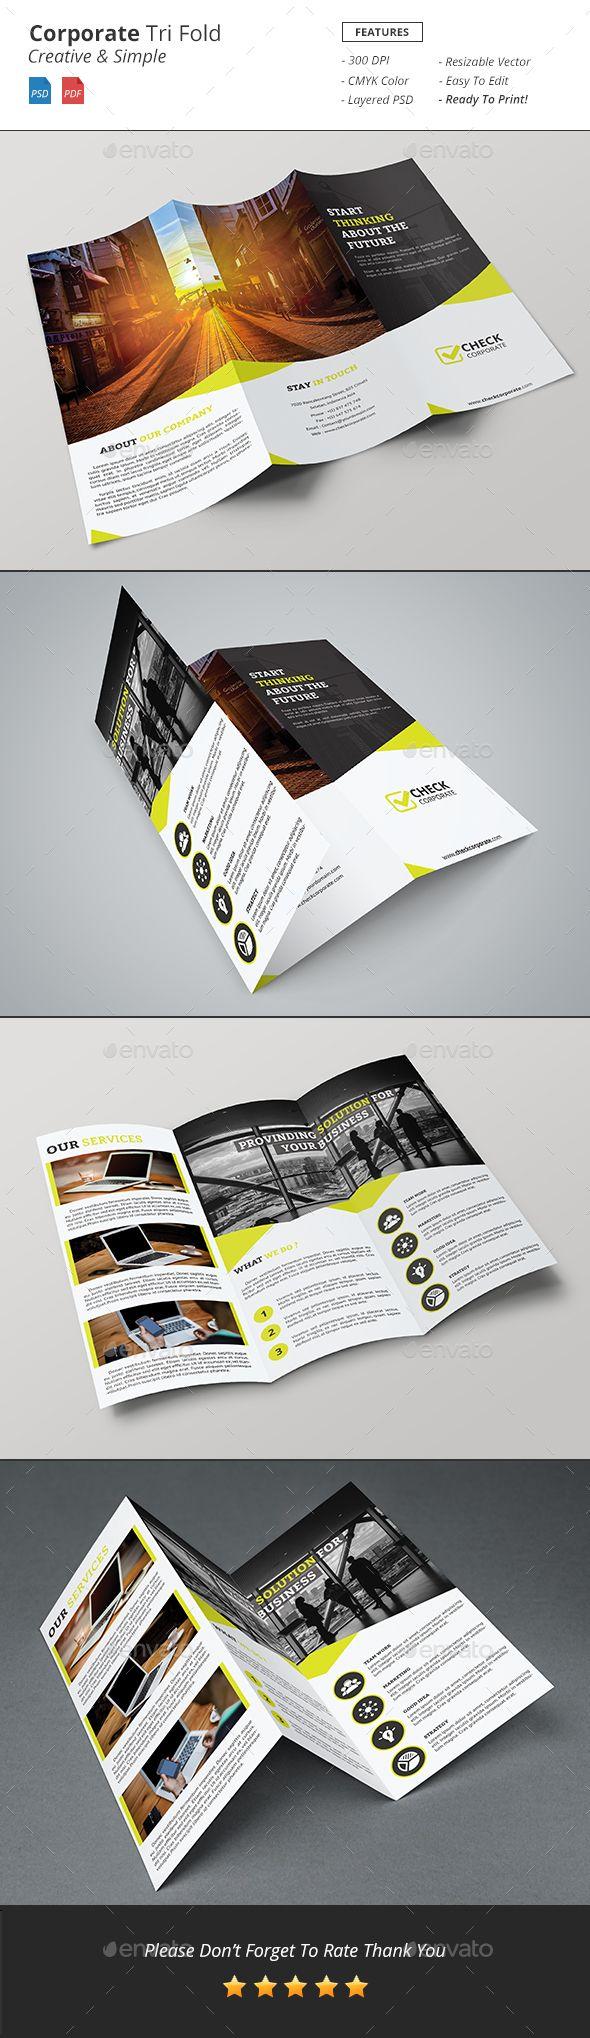 Corporate Tri-Fold Brochure Template PSD. Download here: http://graphicriver.net/item/corporate-trifold-brochure/16684764?ref=ksioks